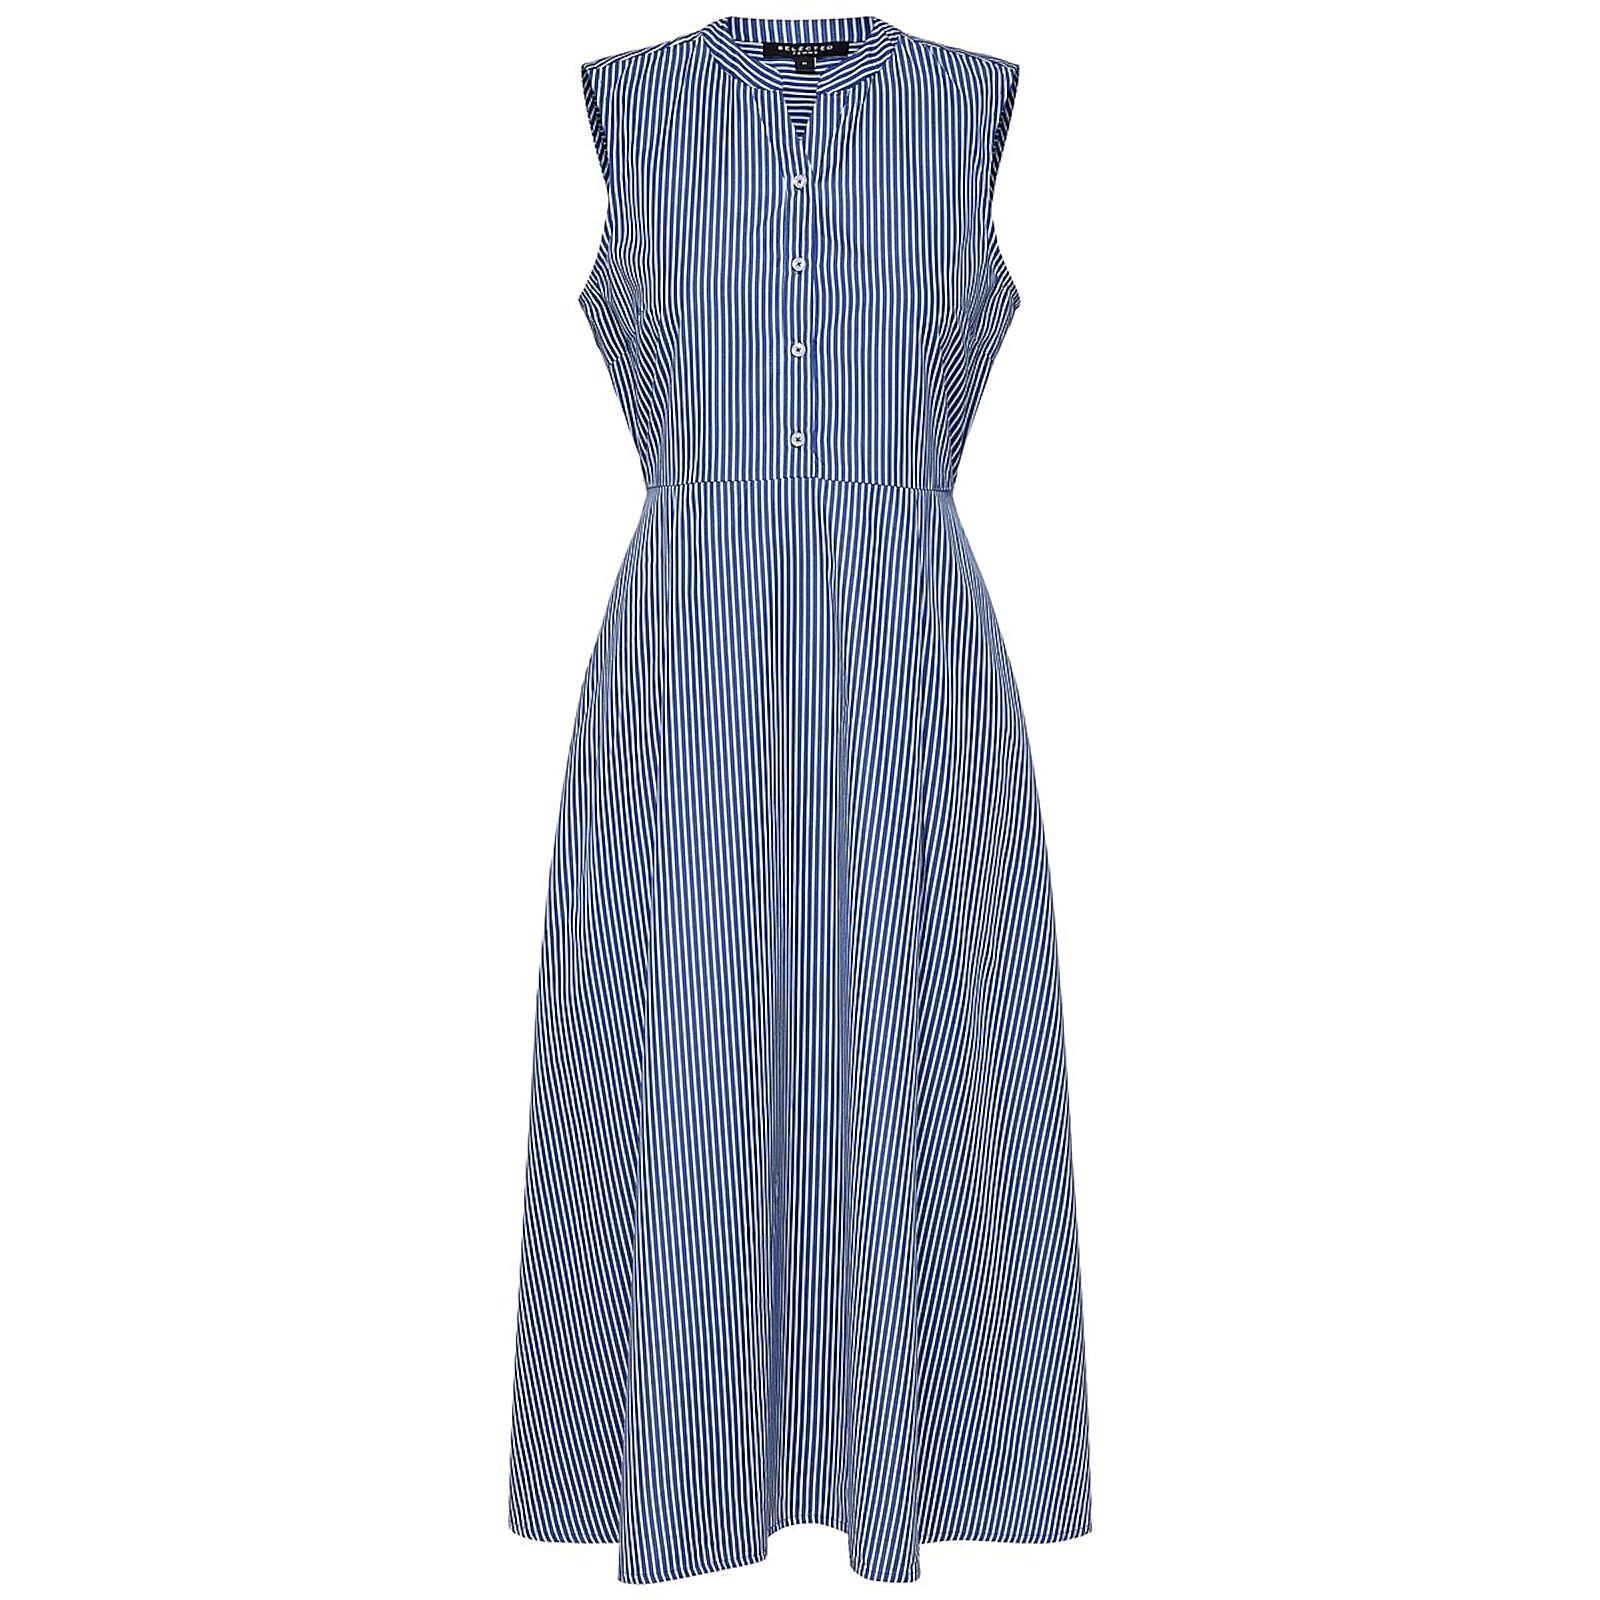 SELECTED FEMME Blusenkleid Althea Blusenkleider weiß Damen Gr. 40